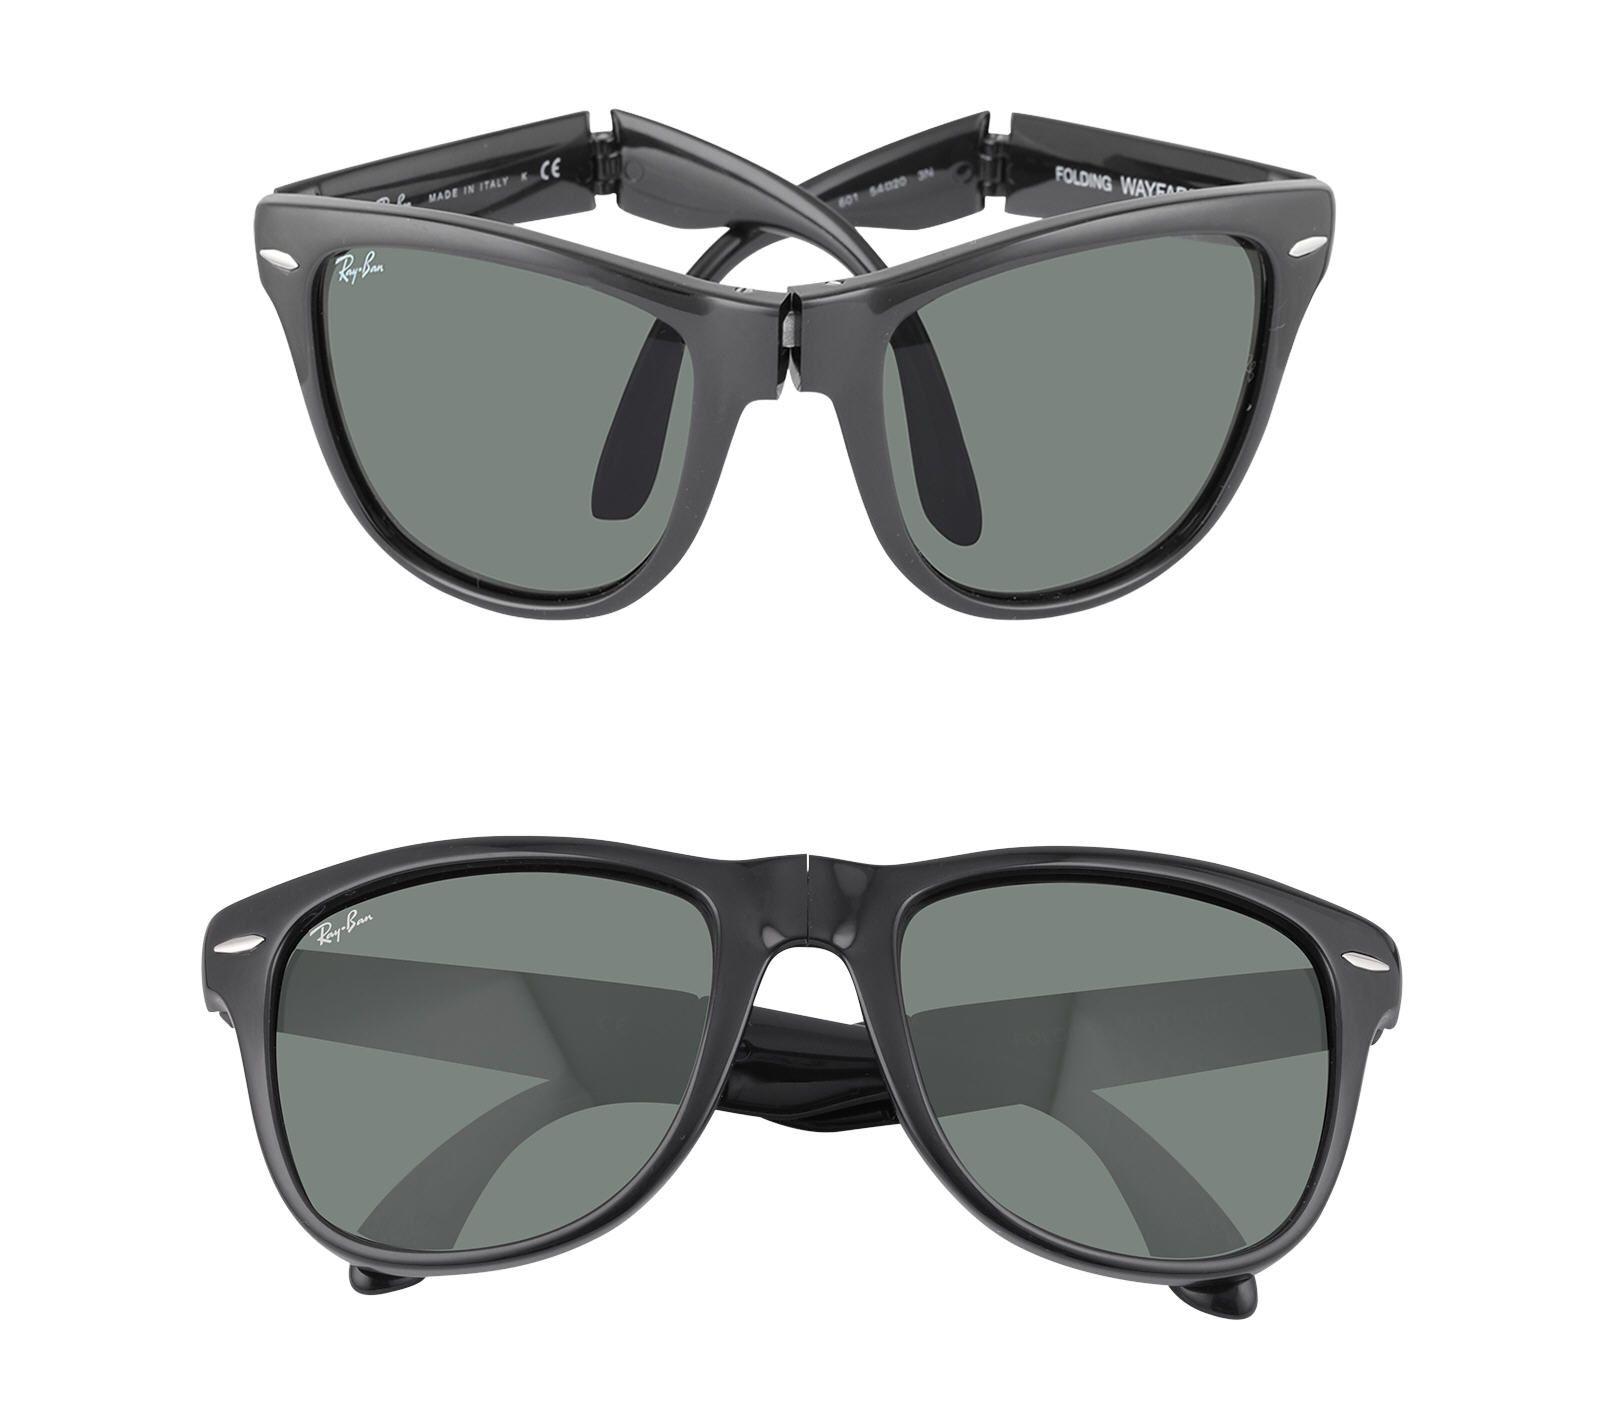 prix lunettes ray ban new york